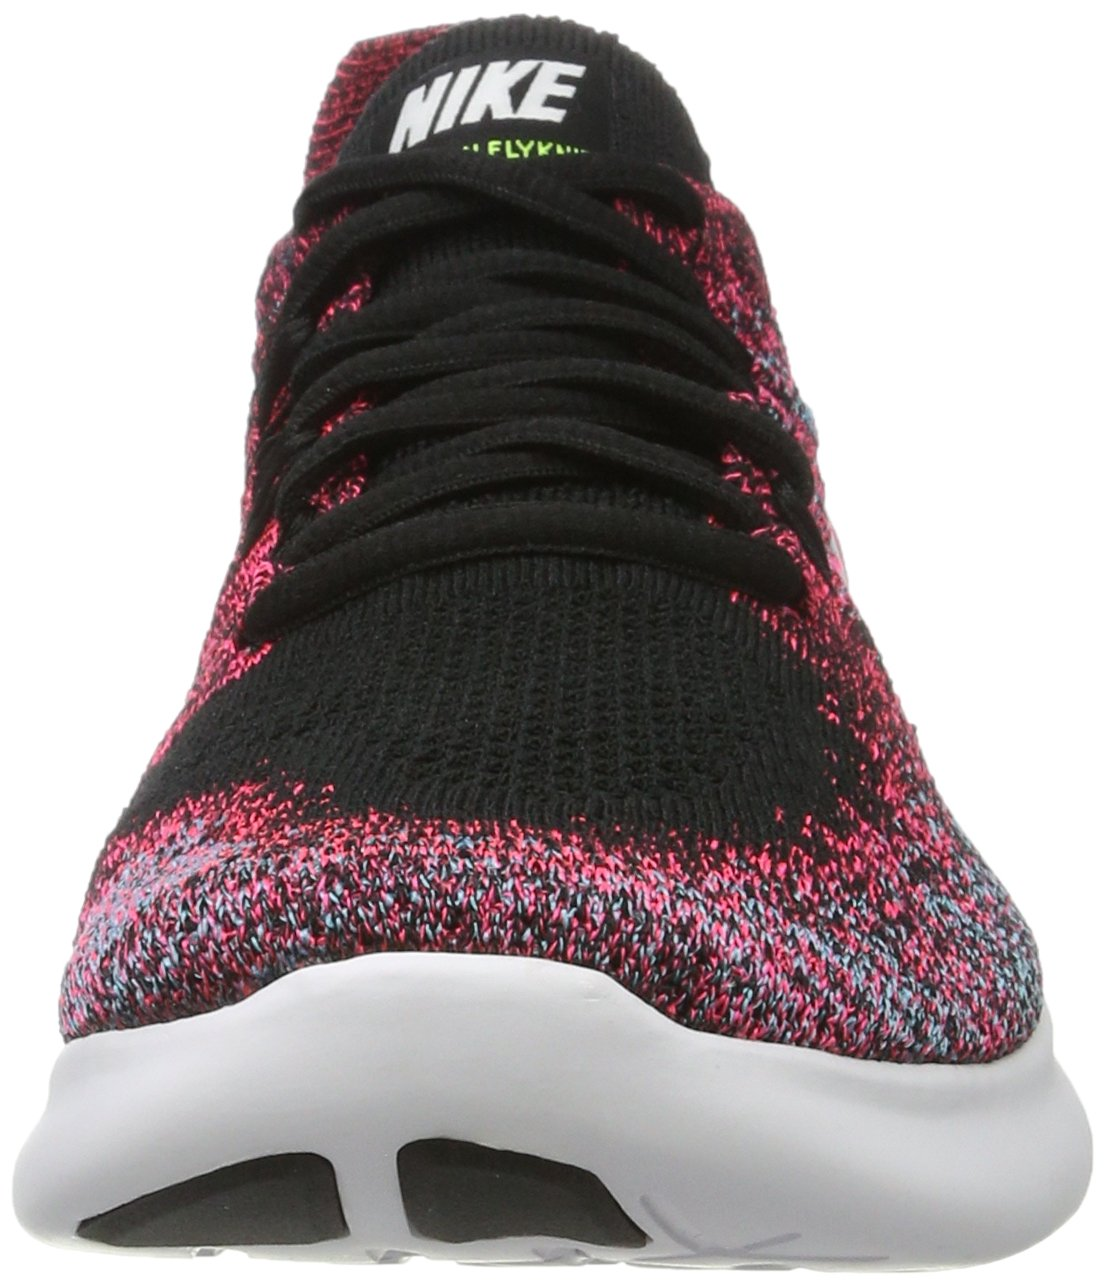 NIKE Women's Free RN Flyknit 2017 Running Shoe B007QZSV12 9 B(M) US Black/White-racer Pink-gamma Blue